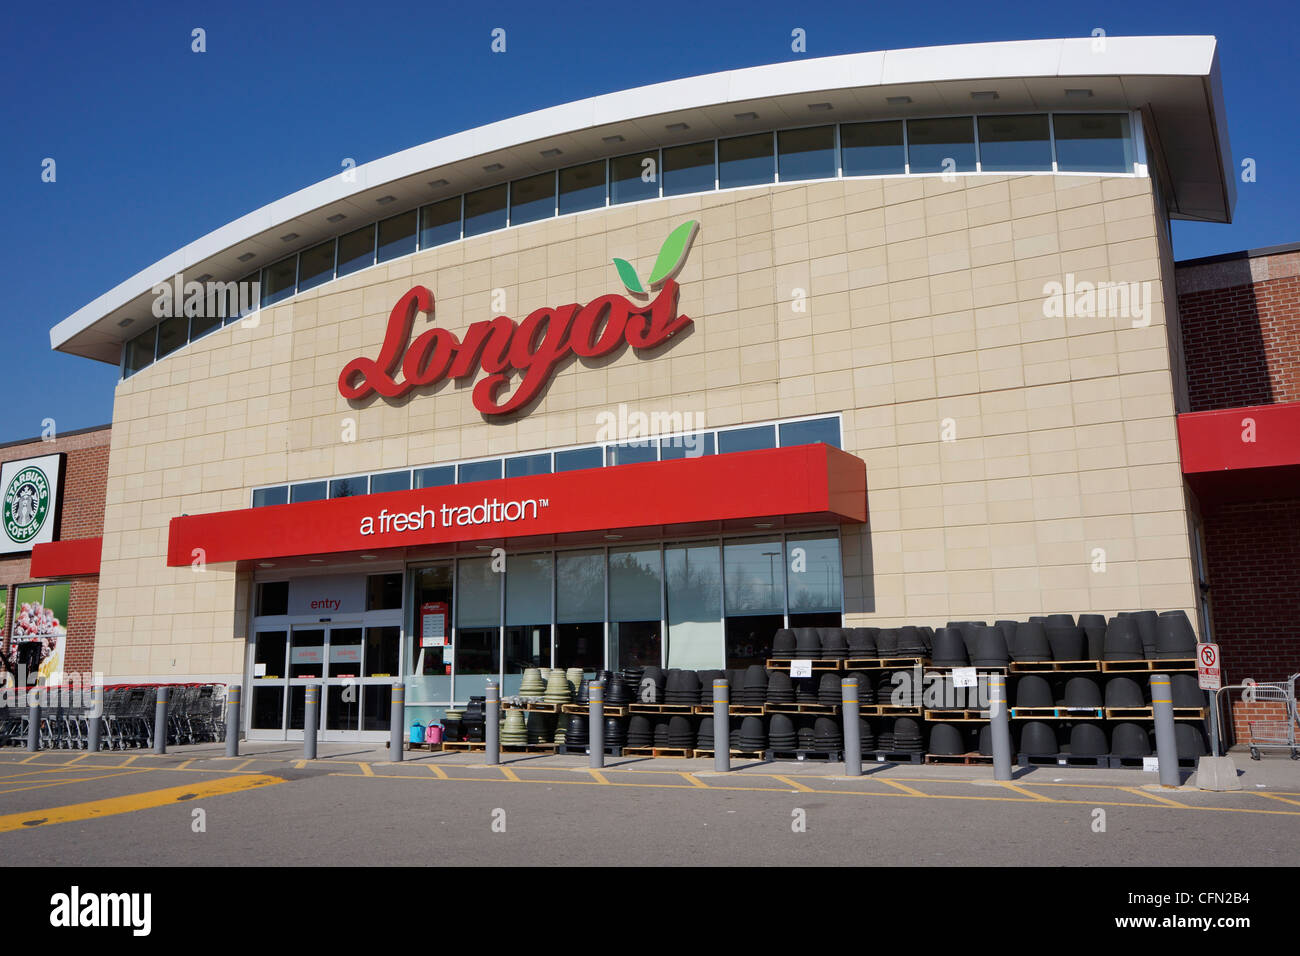 Longo, Lebensmittelgeschäft Stockbild